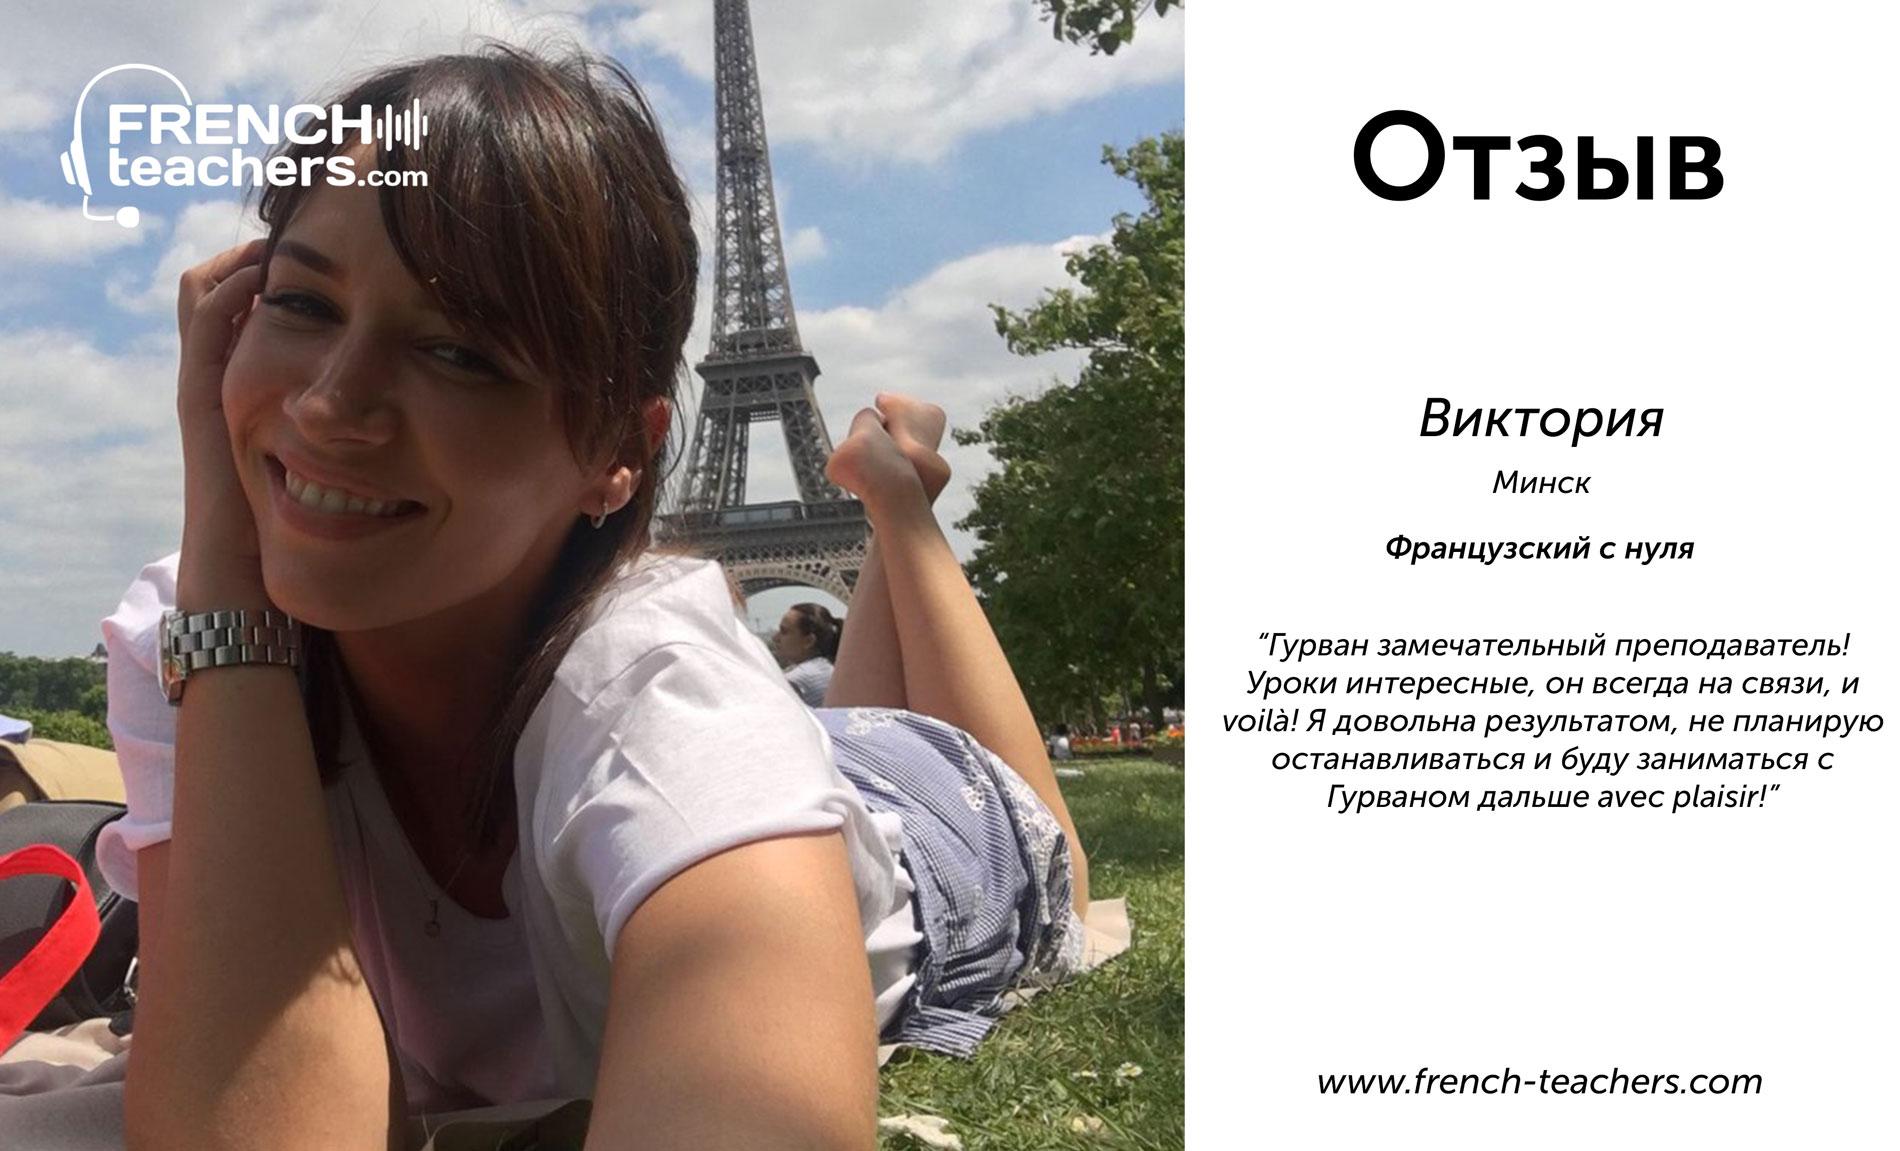 Отзыв, онлайн уроки французского языка по Skype с носитедем